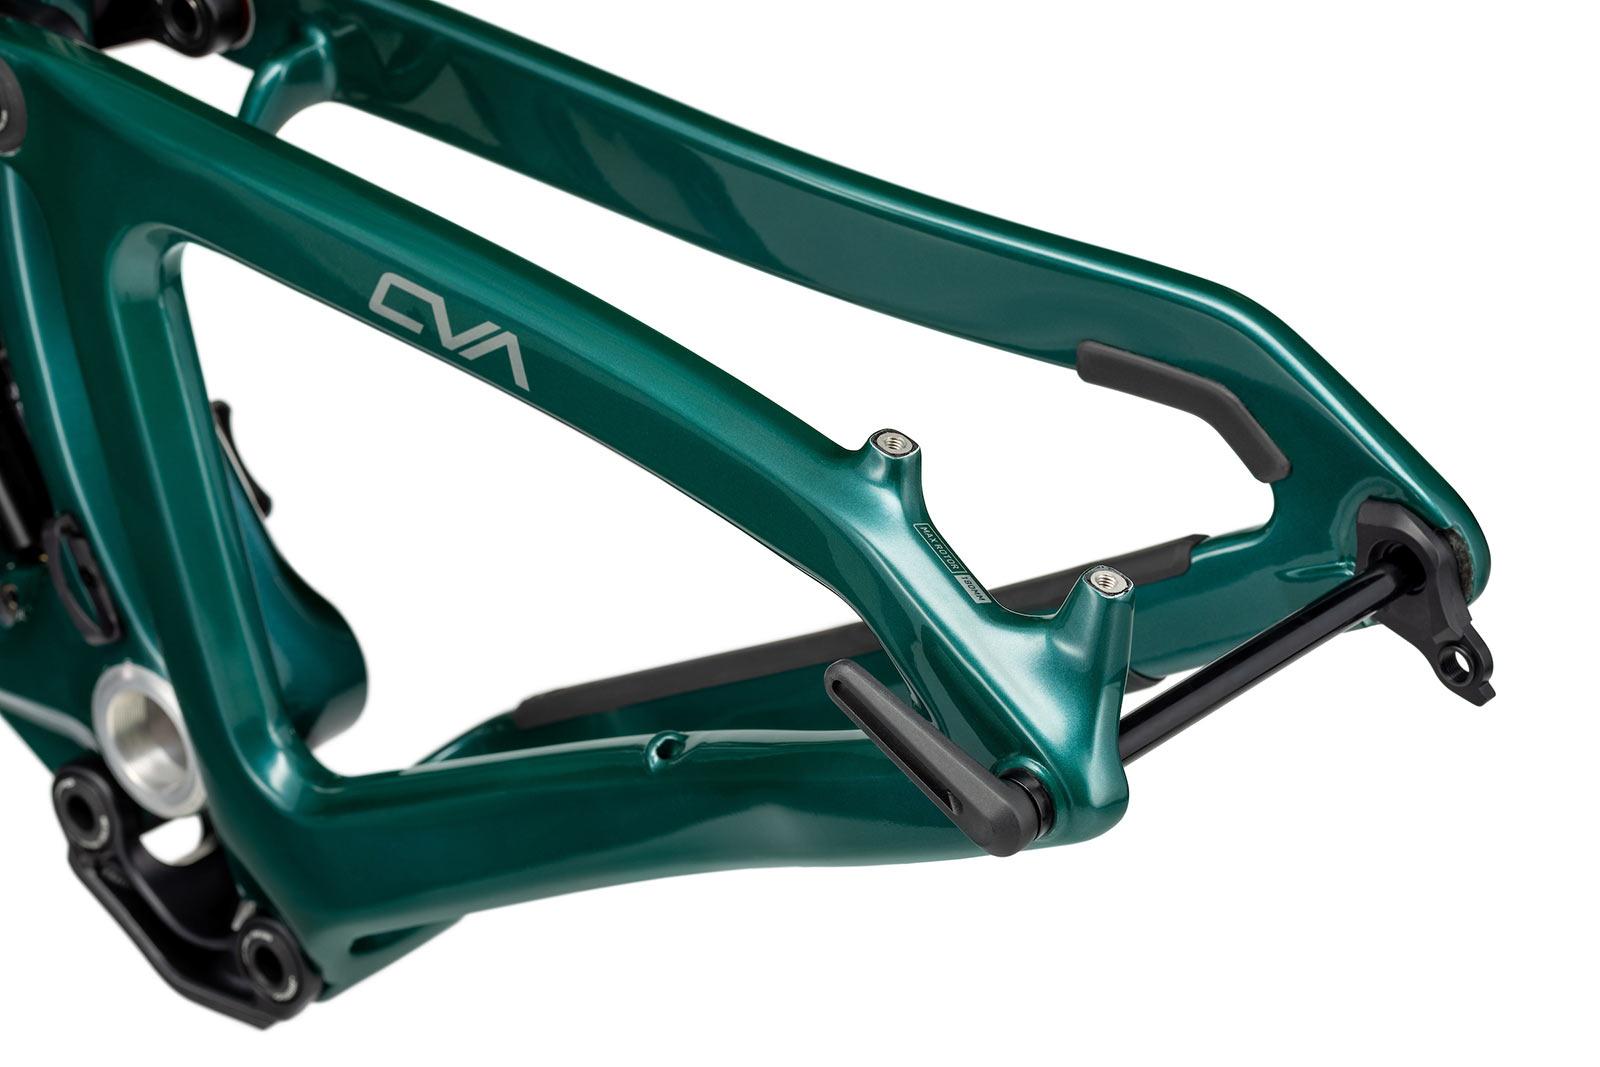 new niner jet 9 rdo trail mountain bike closeup rear dropout details